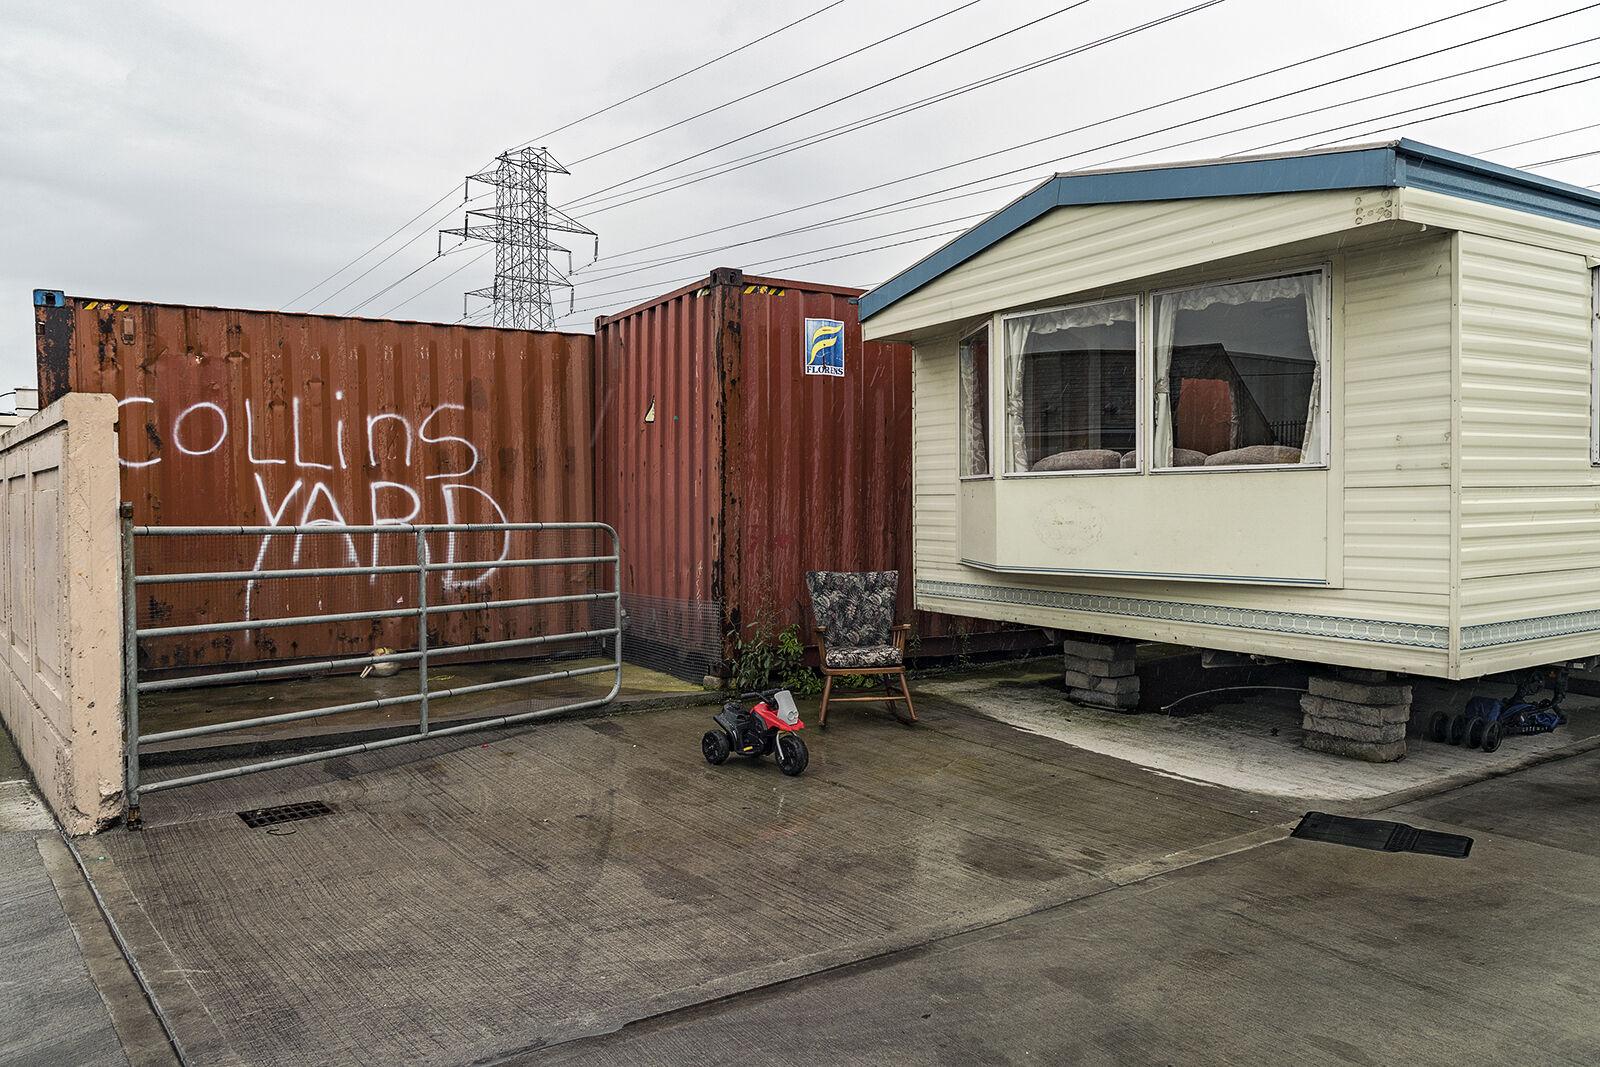 Collins Yard, Dublin, Ireland 2019